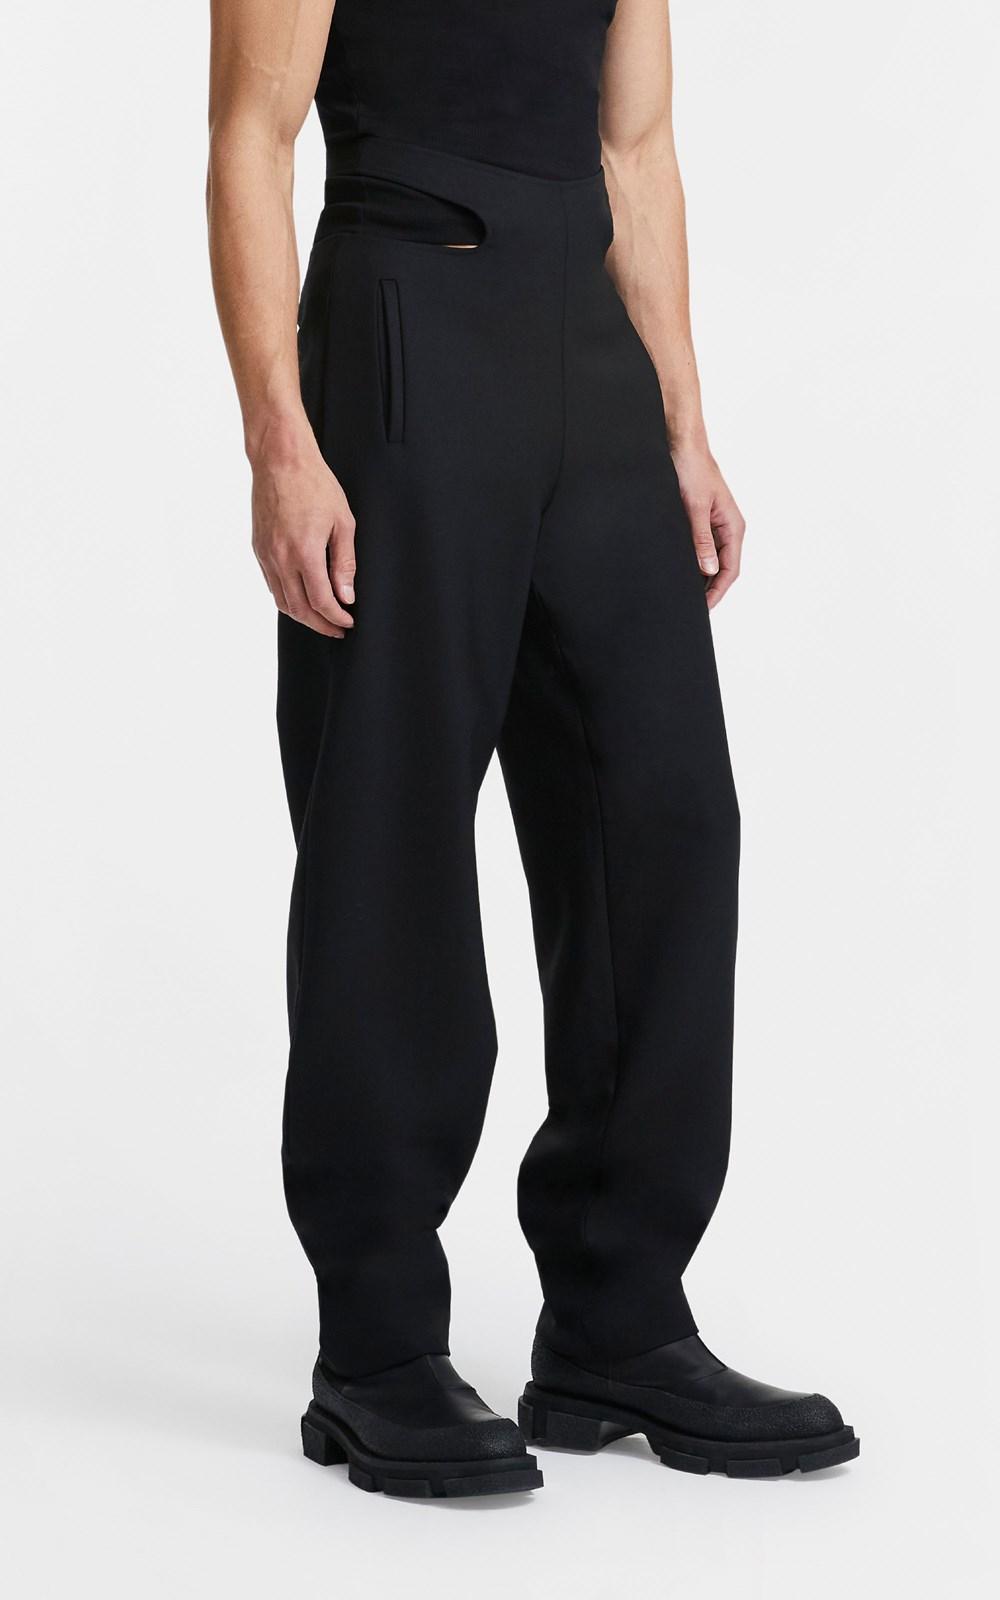 Pants | Y FRONT WOOL PANT